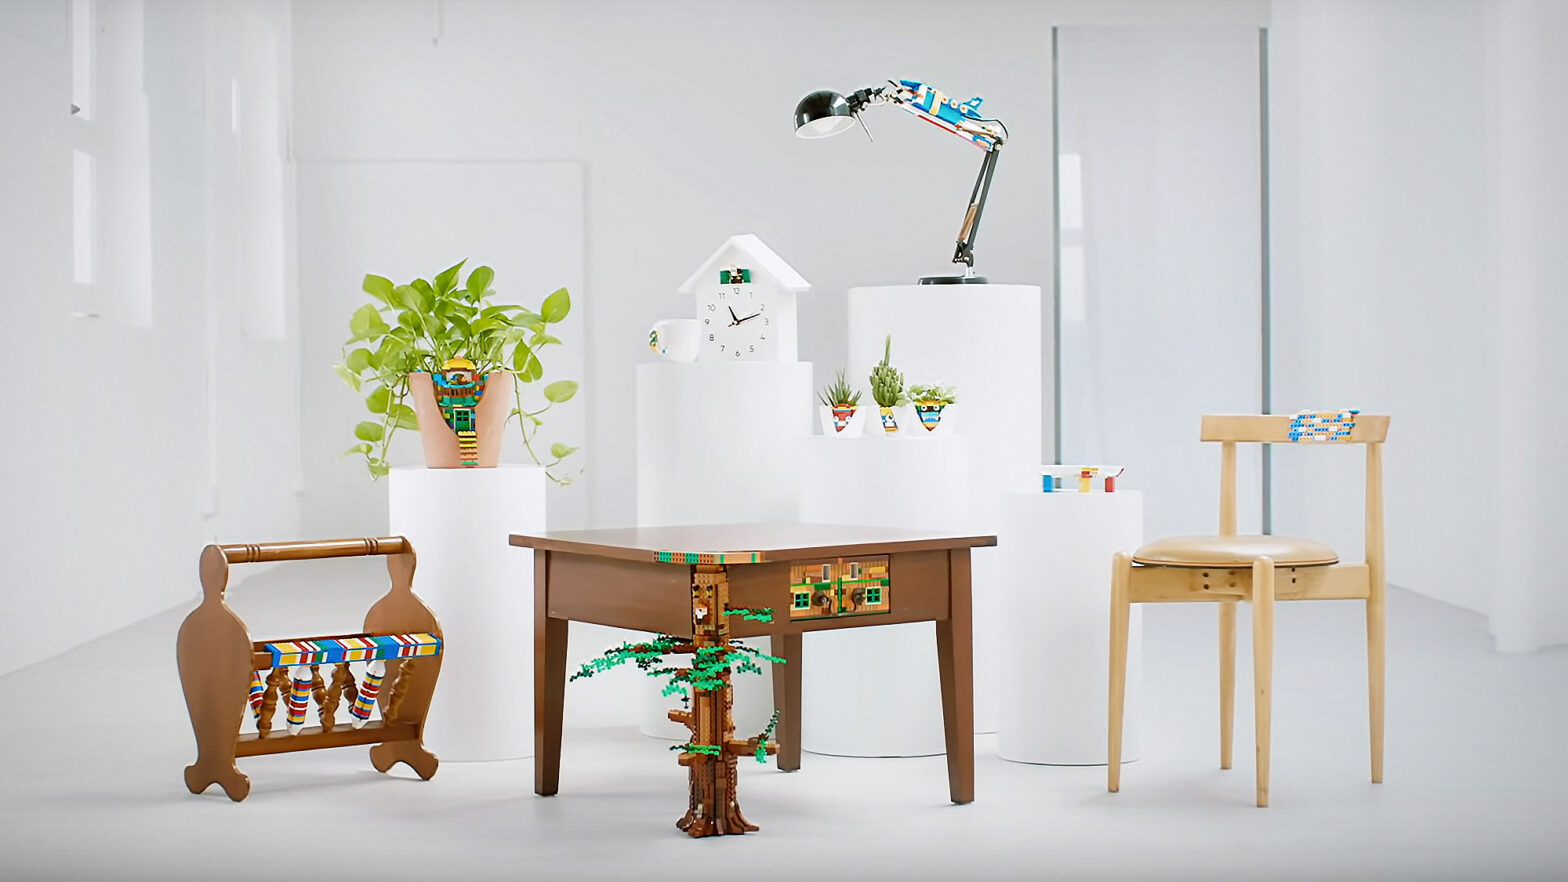 LEGO TSUGI Using LEGO Bricks To Rebuild Broken Furniture